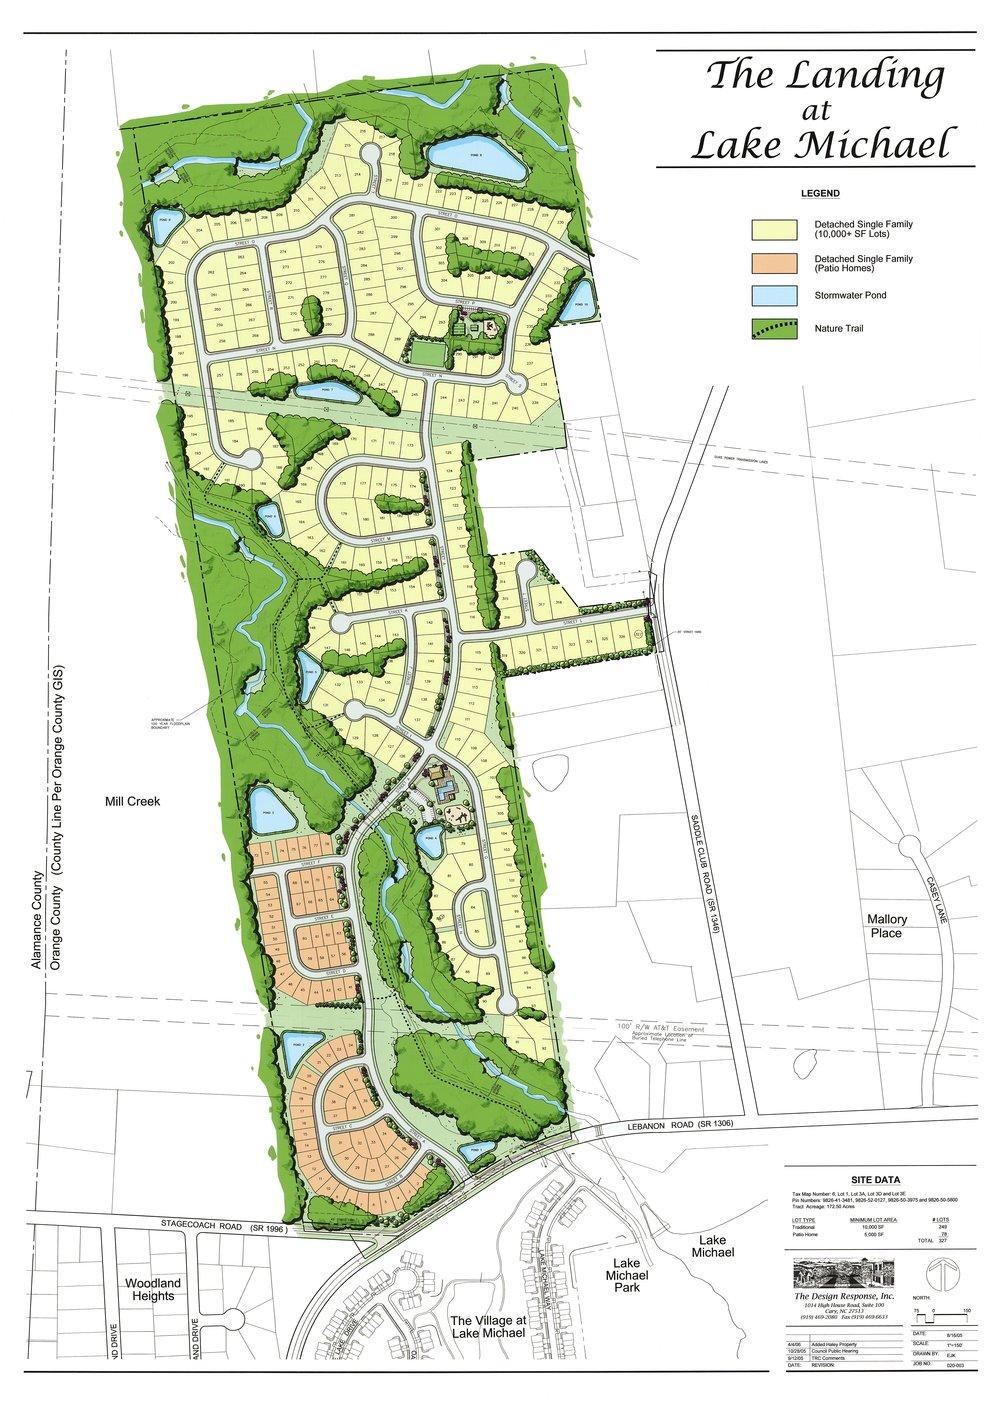 Haley Property - Site Plan 3-20-06.jpg